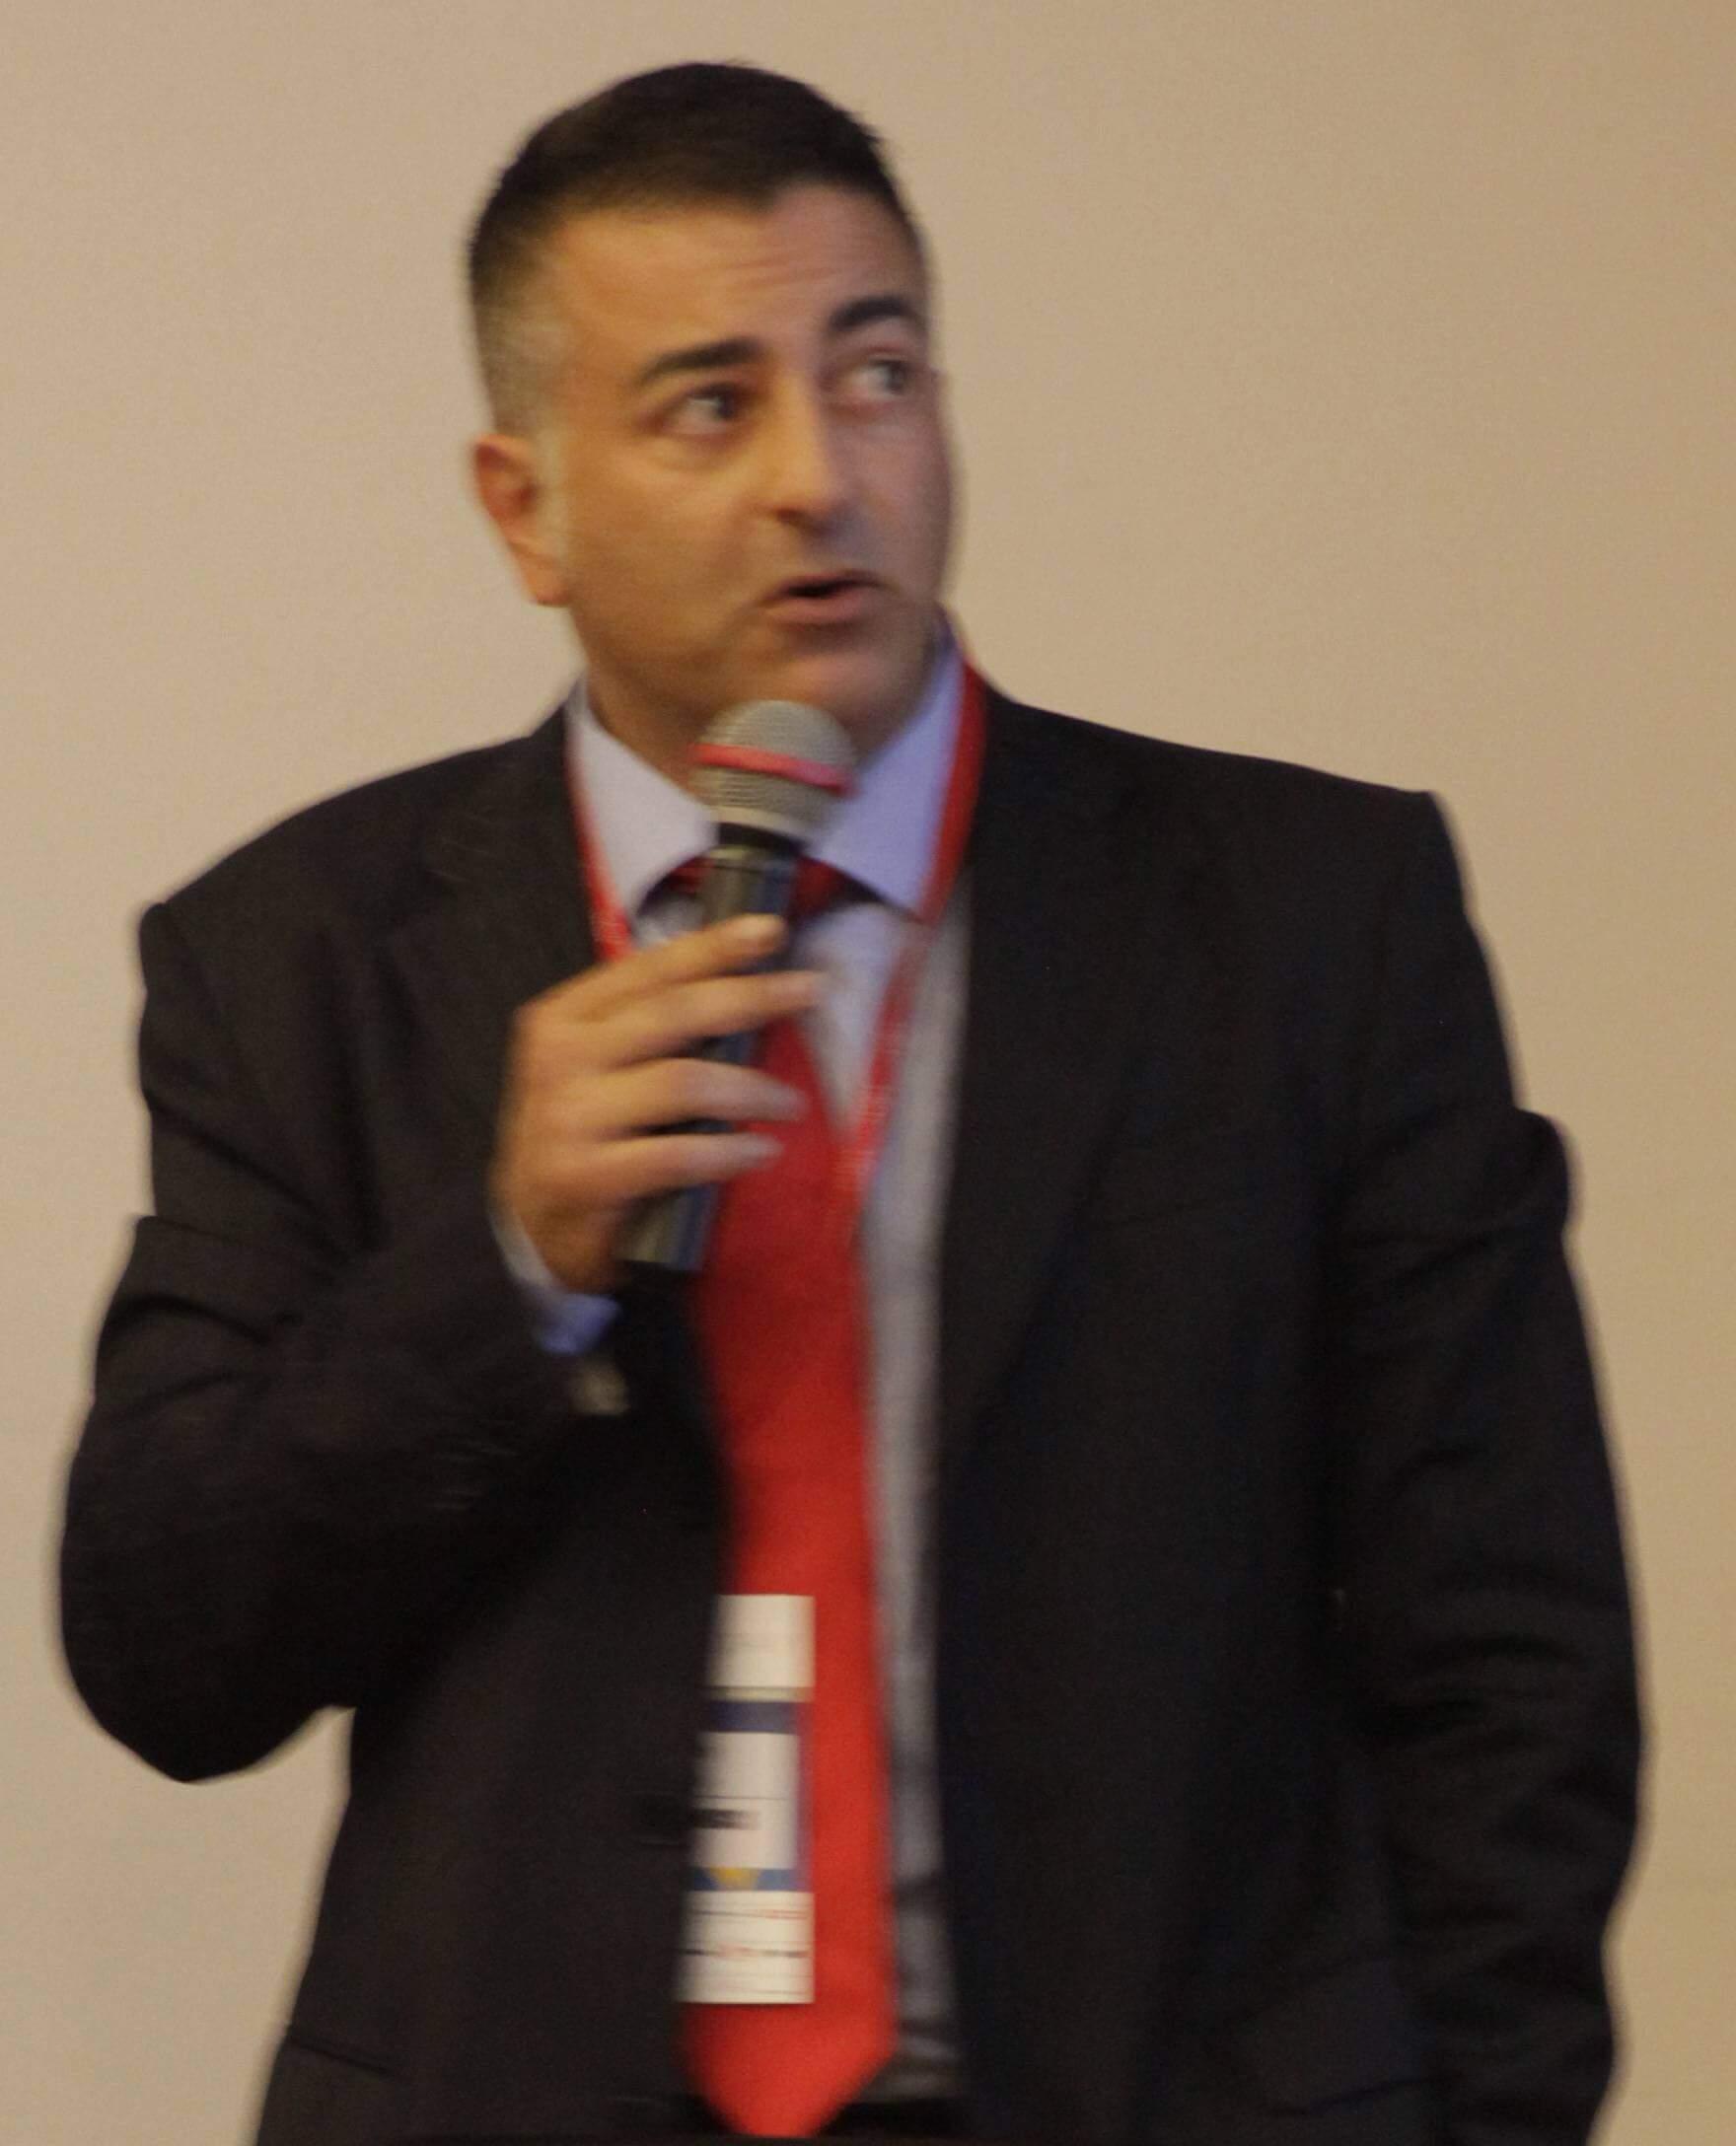 Daniele Carino